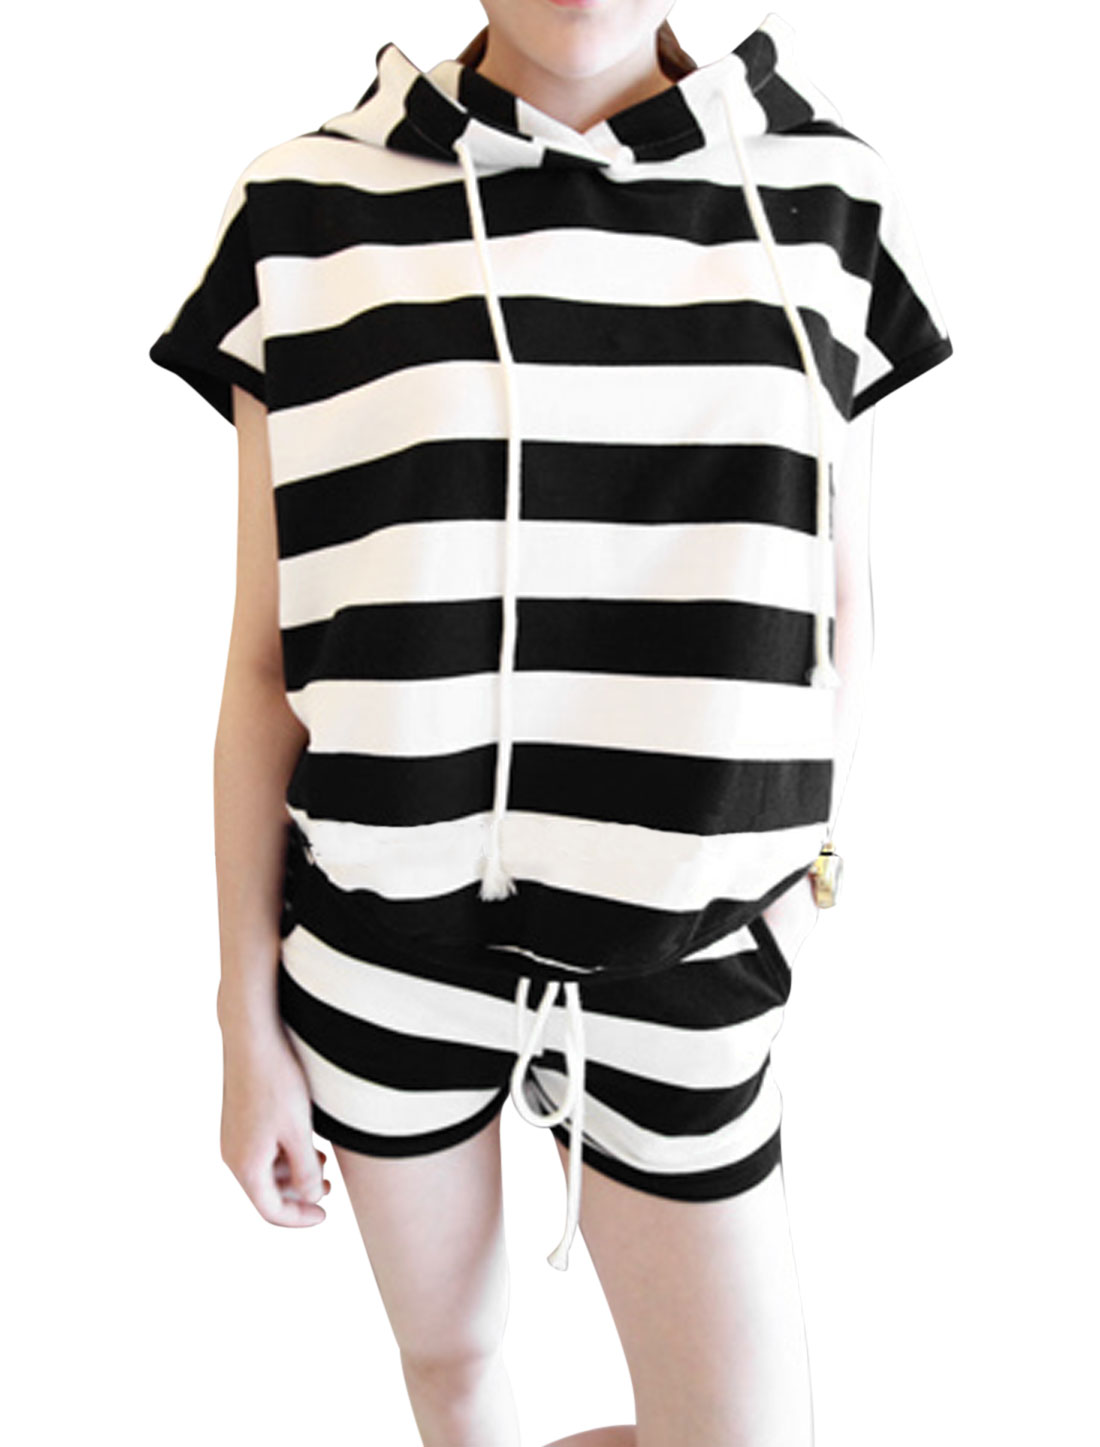 Lady Drawstring Hoody Top w Elastic Drawstring Waist Shorts Black White XS